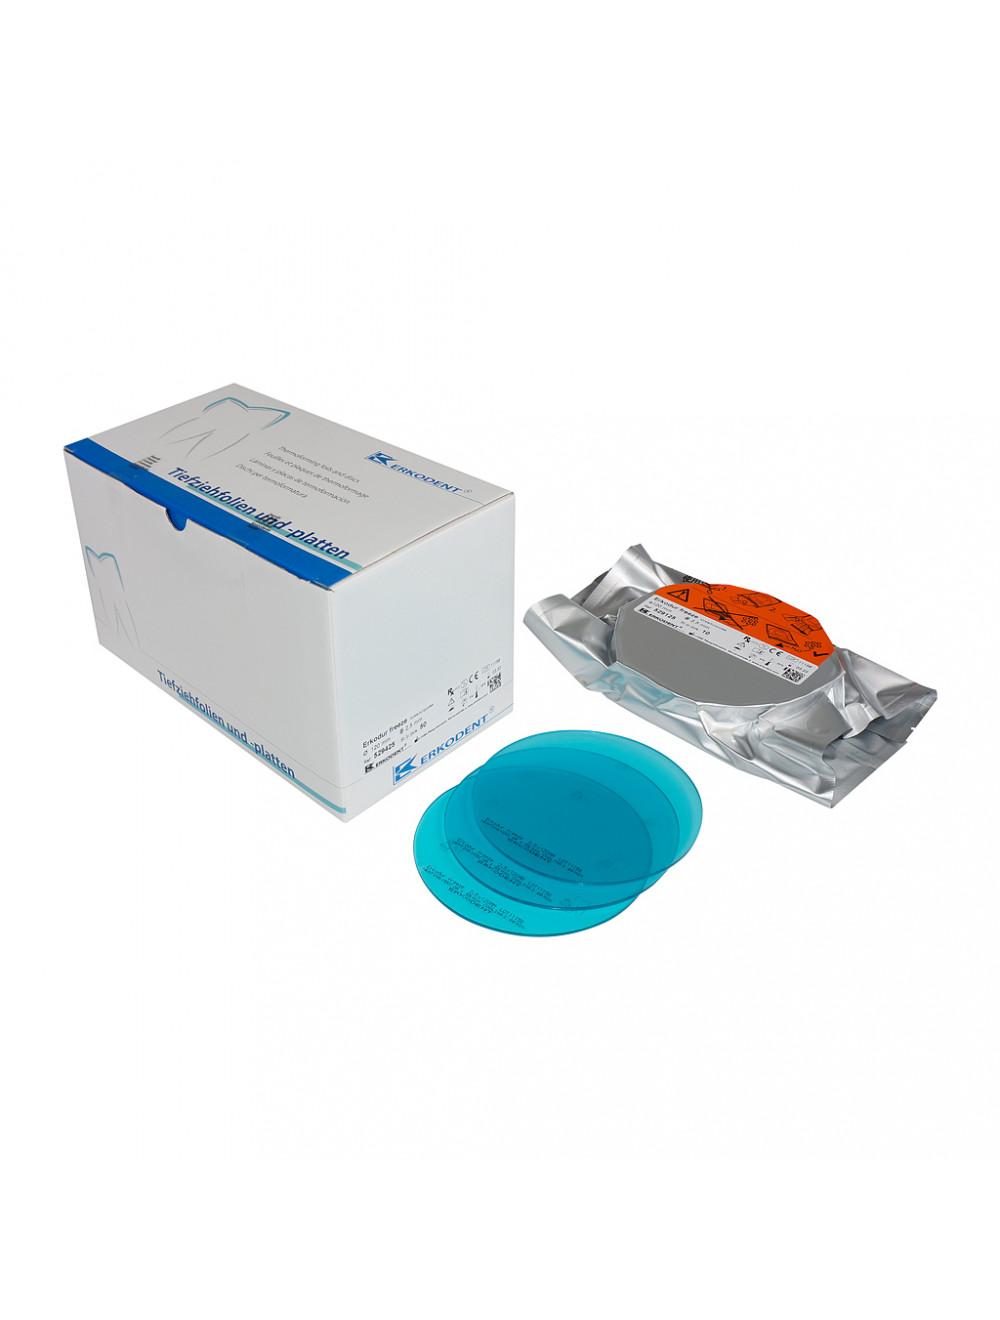 Erkodent Erkodur Tiefziehfolie freeze türkis-transparent, 1,5 mm, 50 Stück 529415